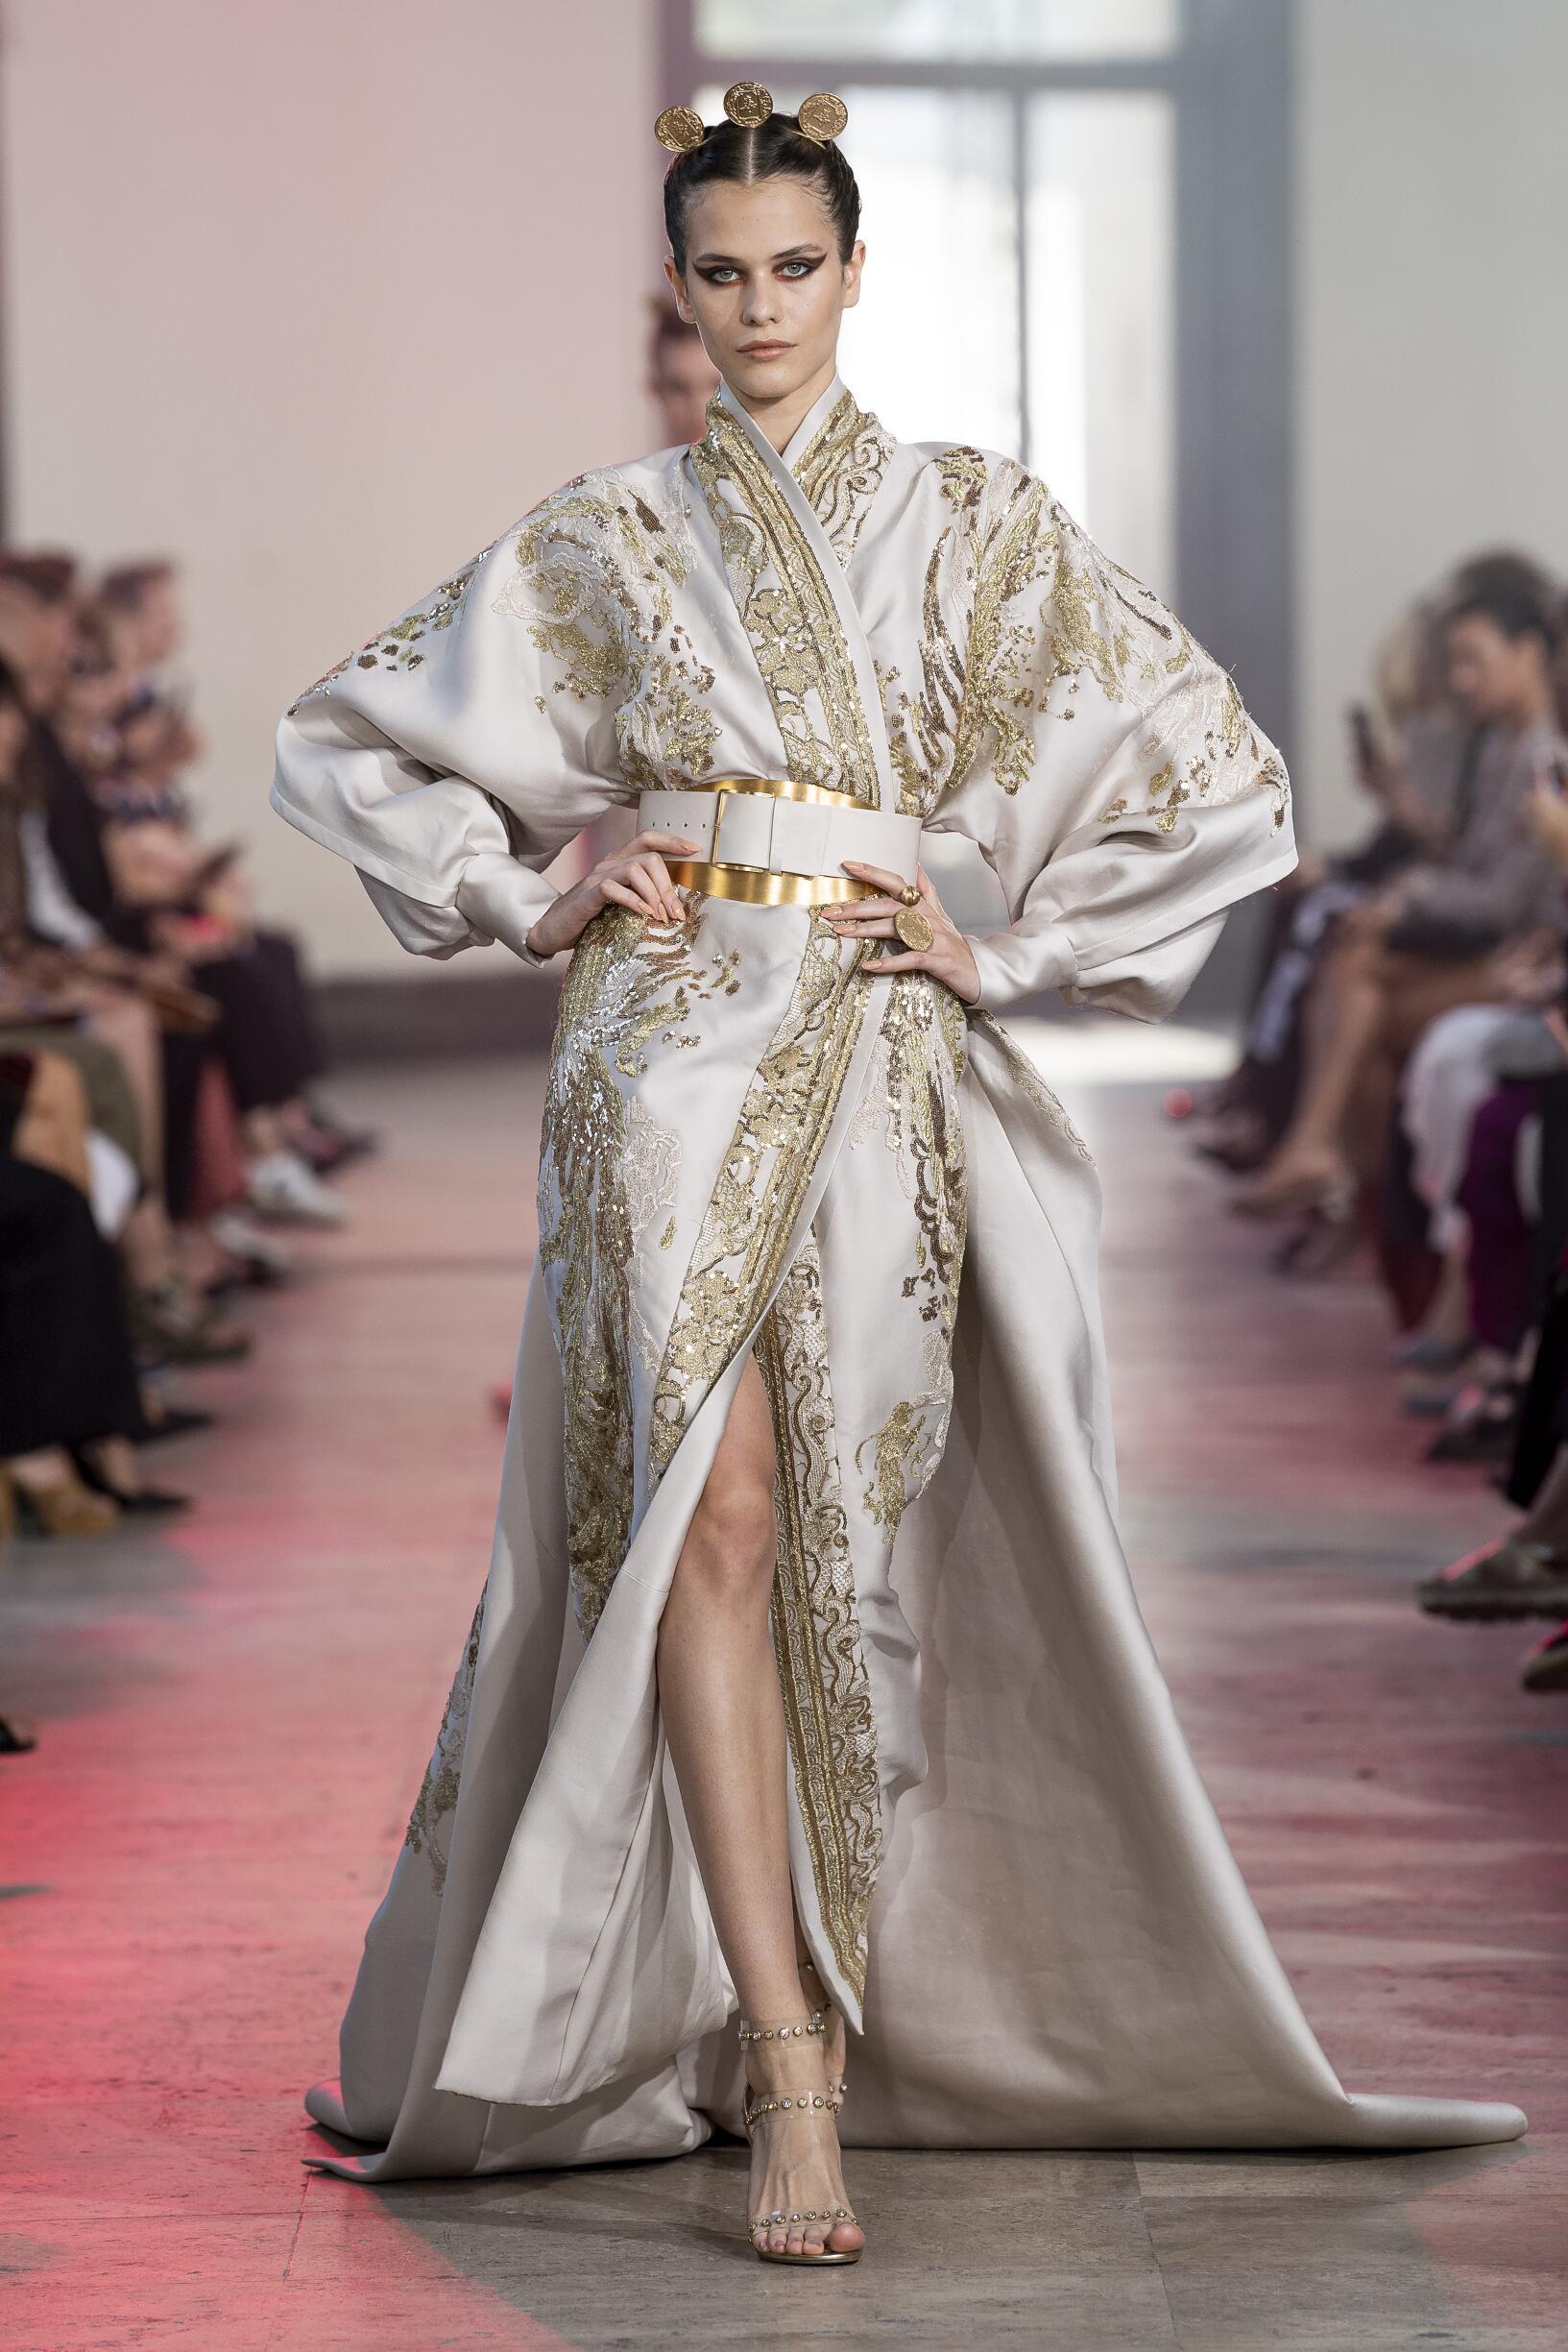 2019 Elie Saab Haute Couture Catwalk Paris Fashion Week